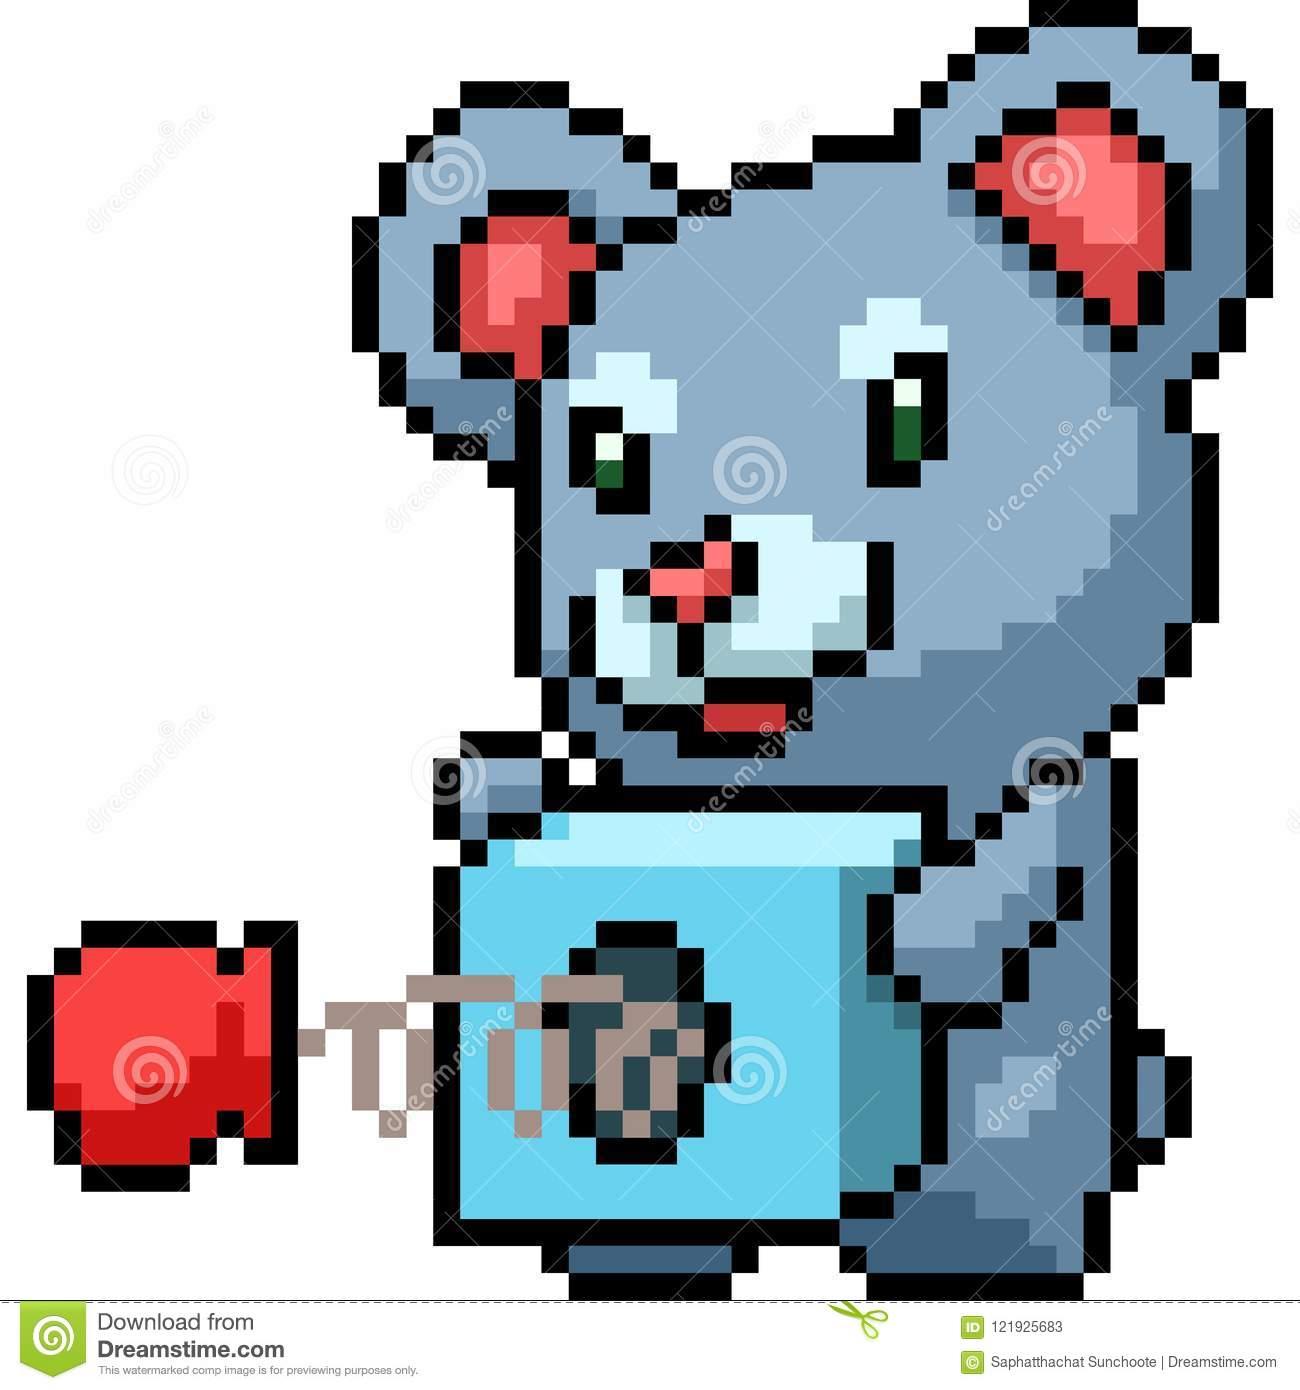 Jouet De Koala D'art De Pixel De Vecteur Illustration De concernant Pixel Jouet